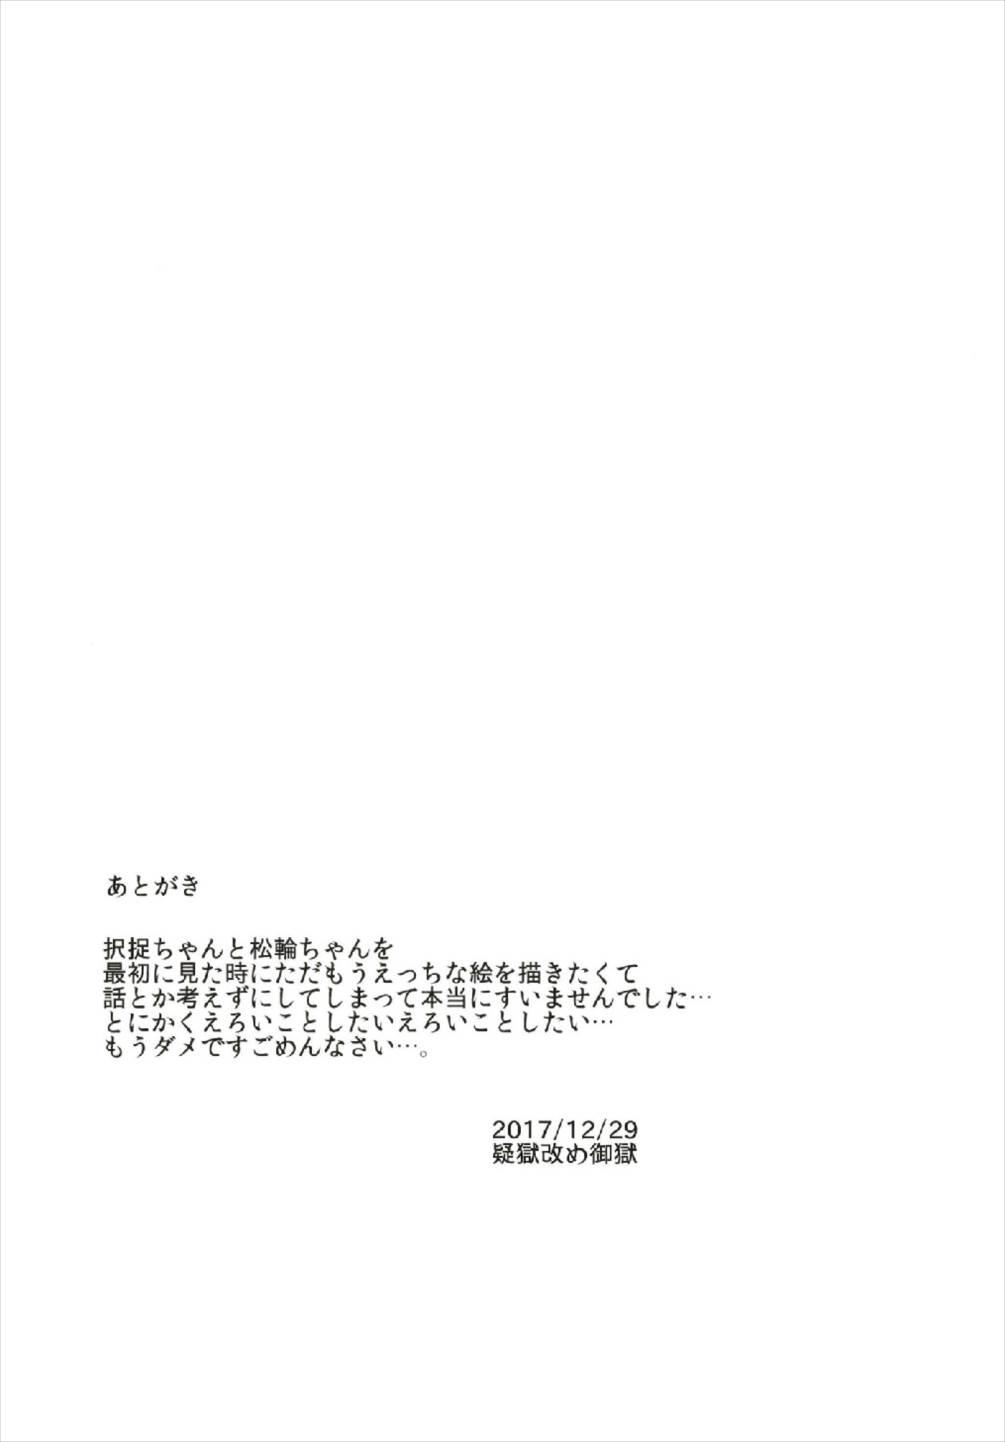 (C93) [Yakimisomura (Utaki)] Matsuwa-chan Etorofu-chan Gomennasai (Kantai Collection -KanColle-) [Chinese] [球磨提督个人汉化] 20